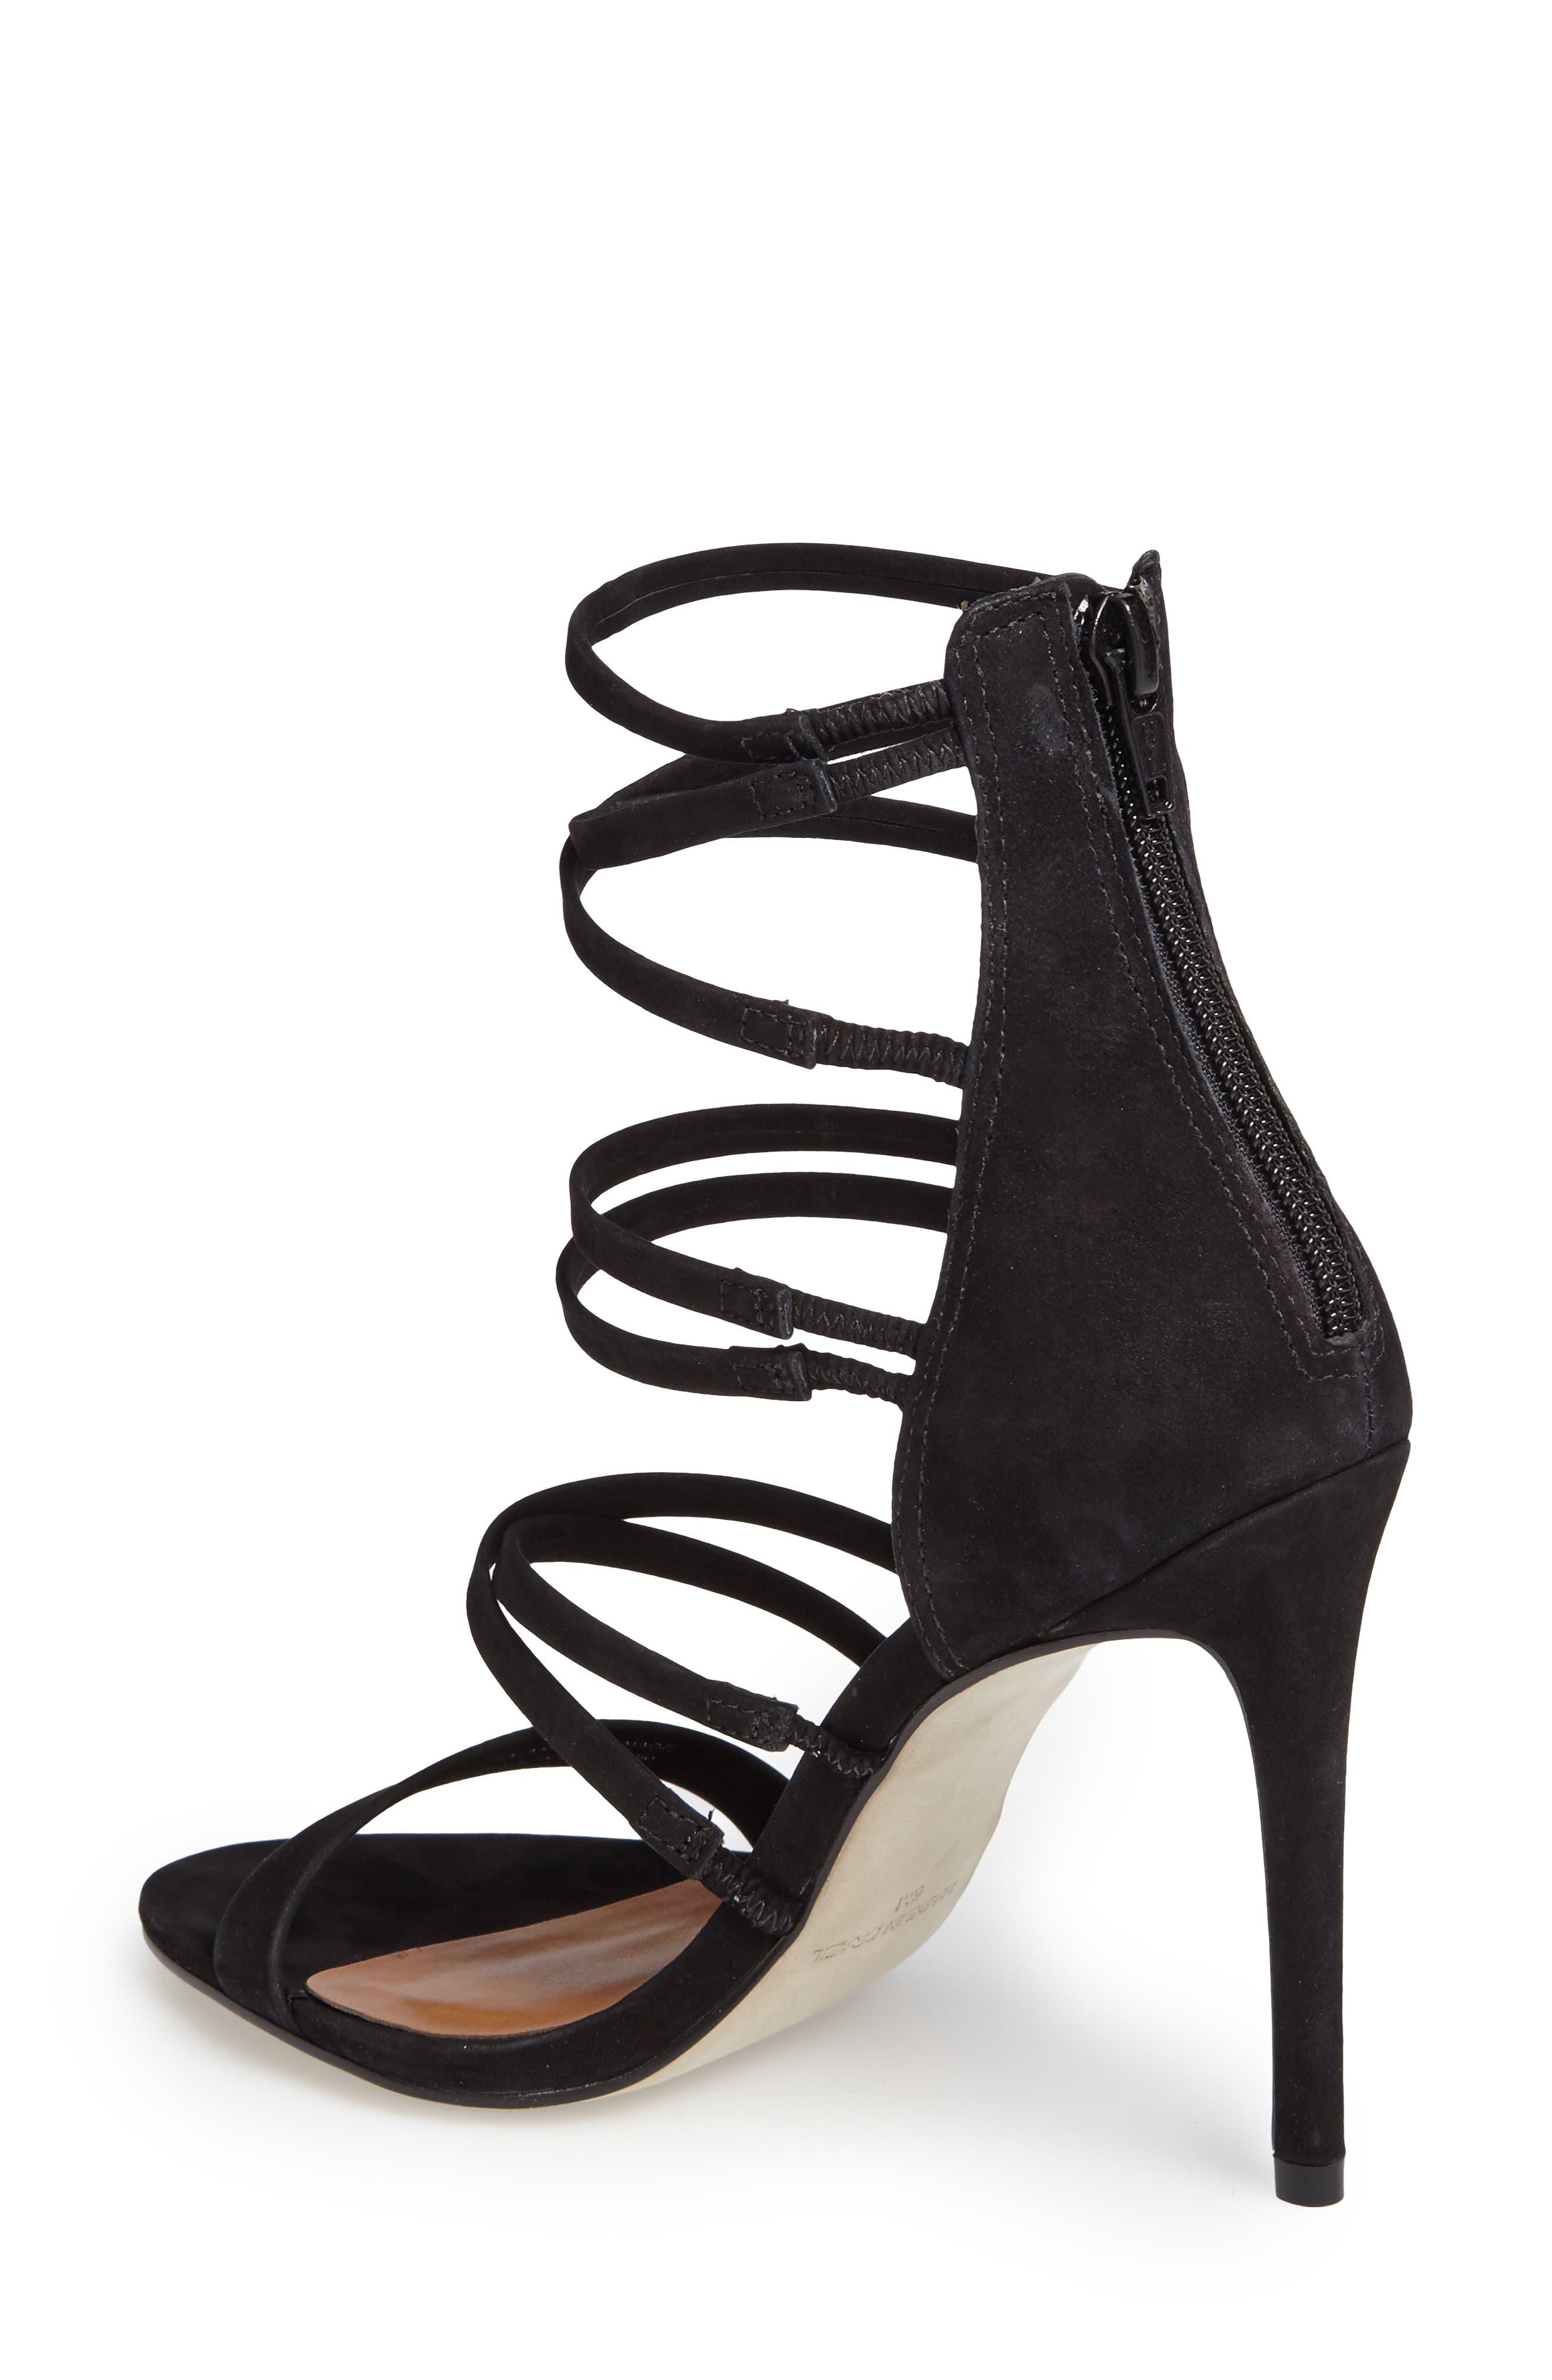 Tierney Sandal,                             Alternate thumbnail 2, color,                             Black Nubuck Leather